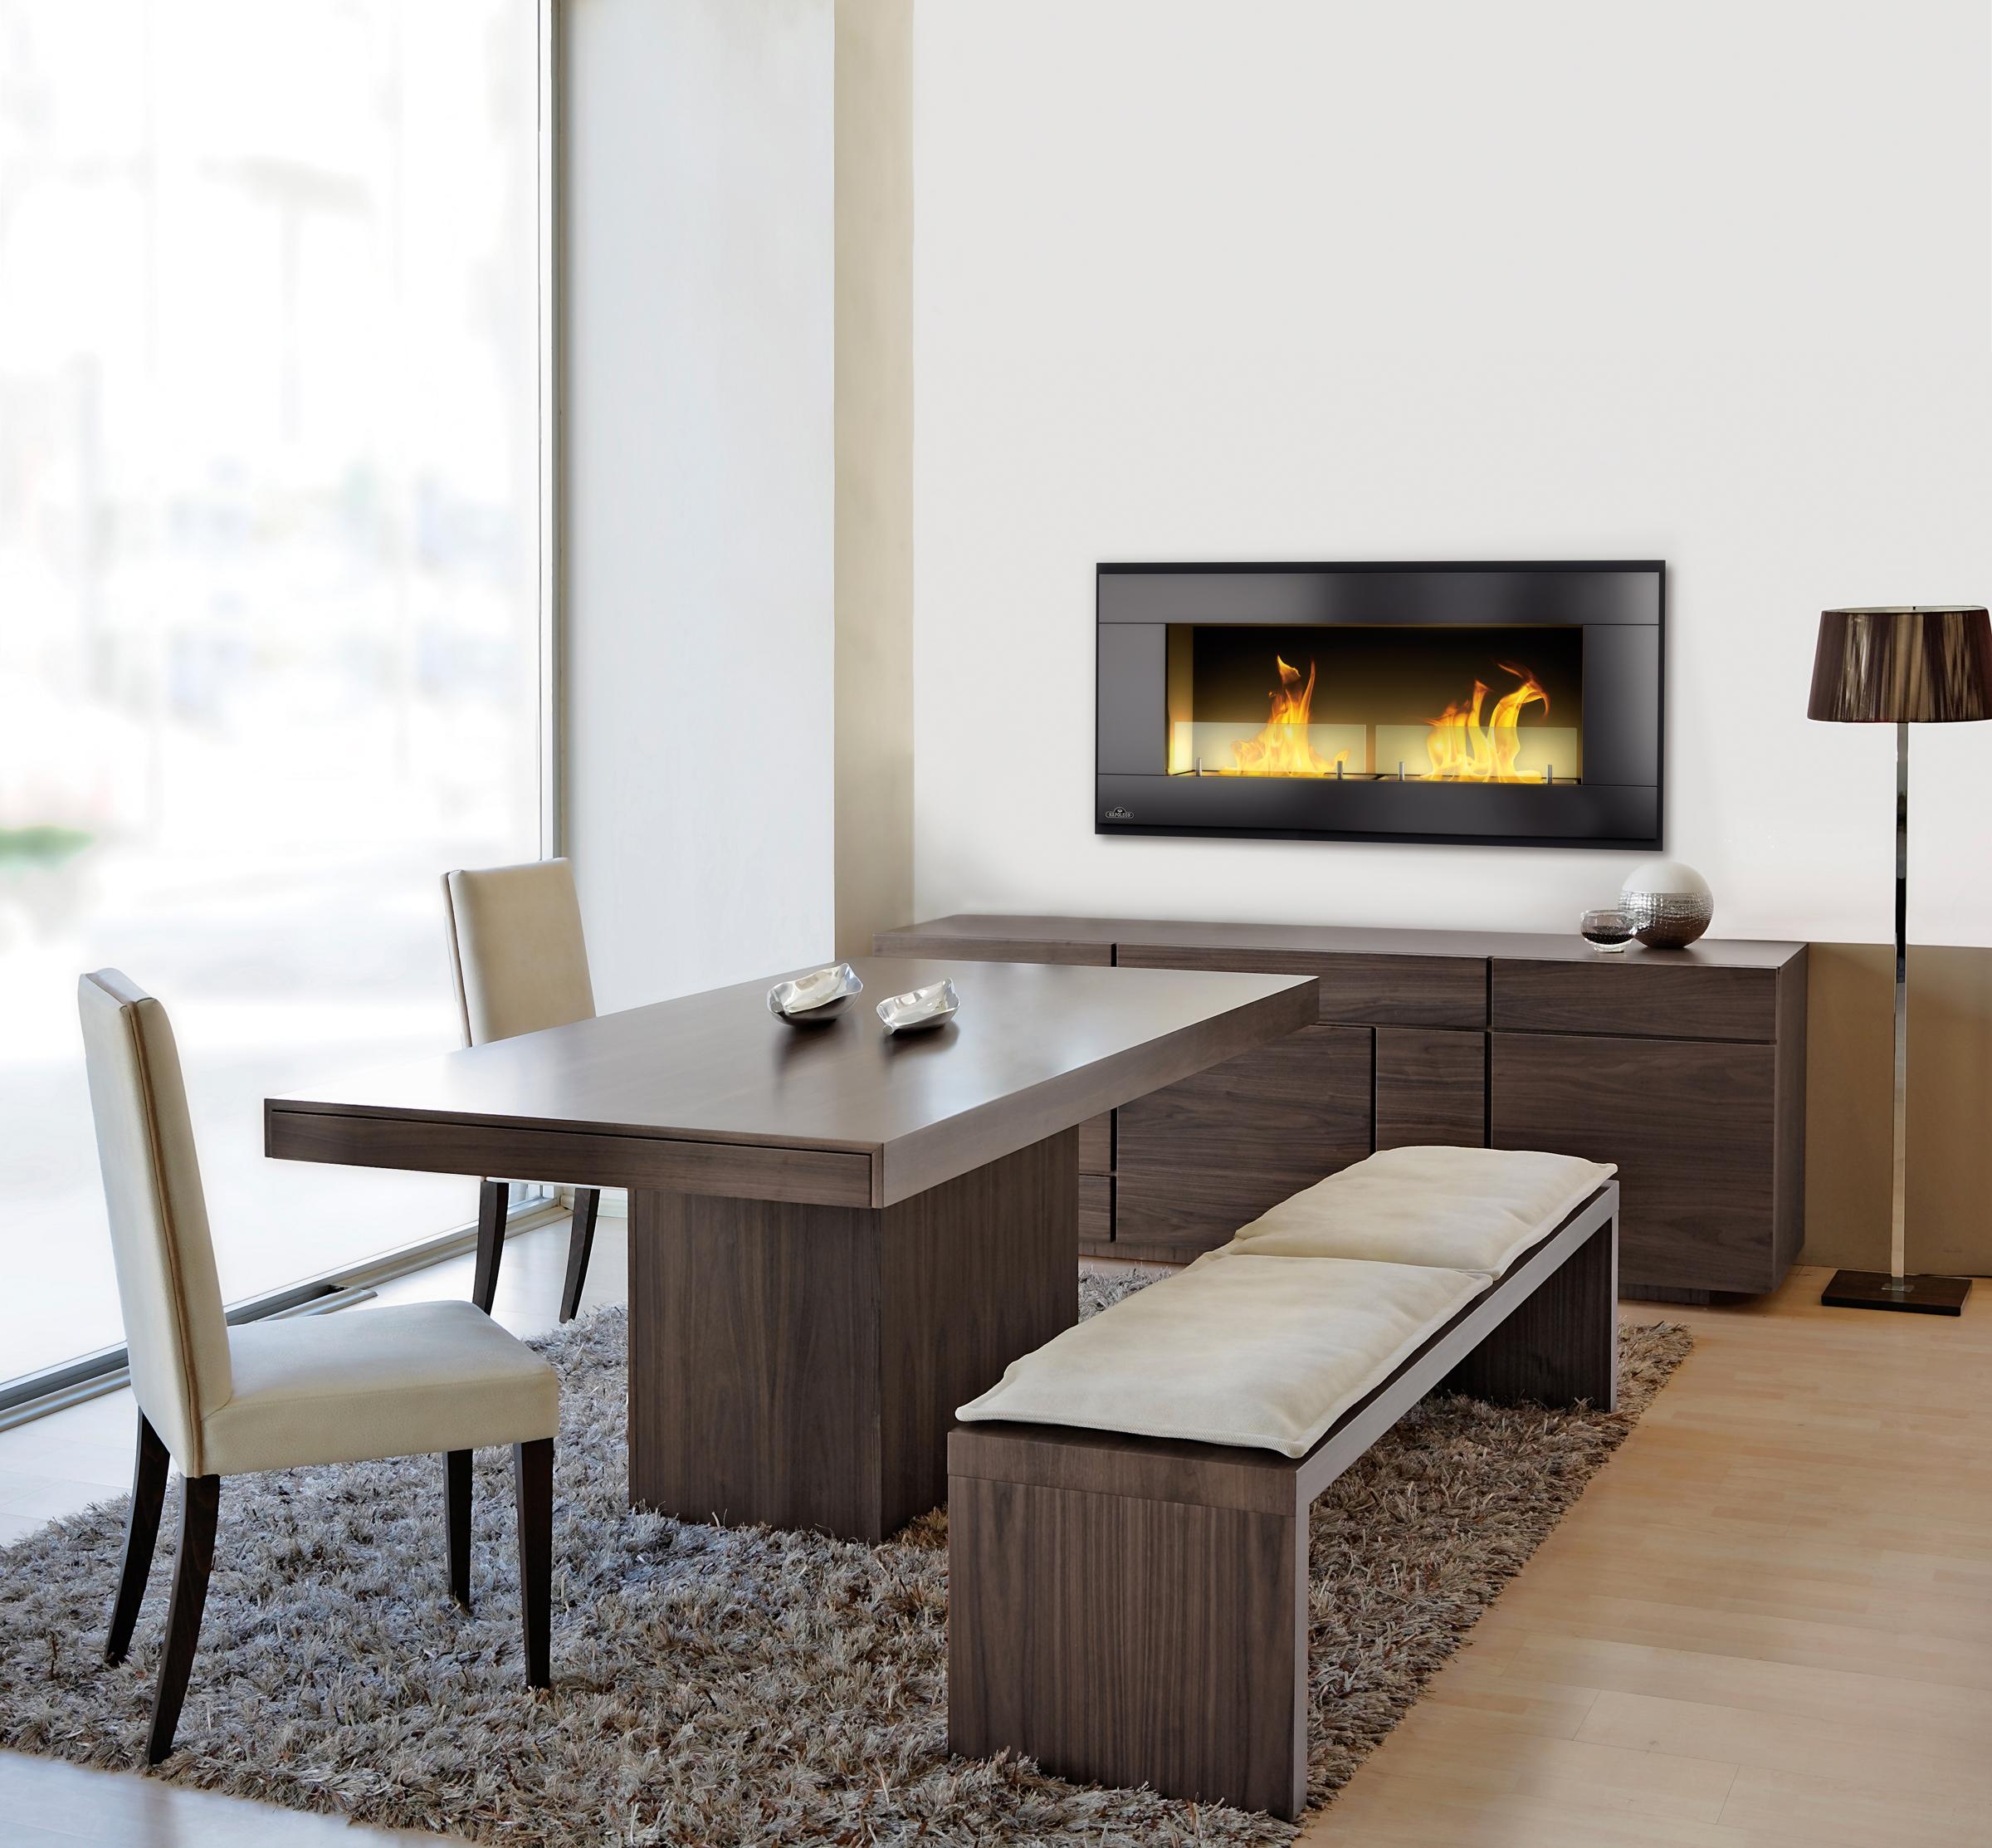 wmfe3 room blk ethanol napoleon fireplaces